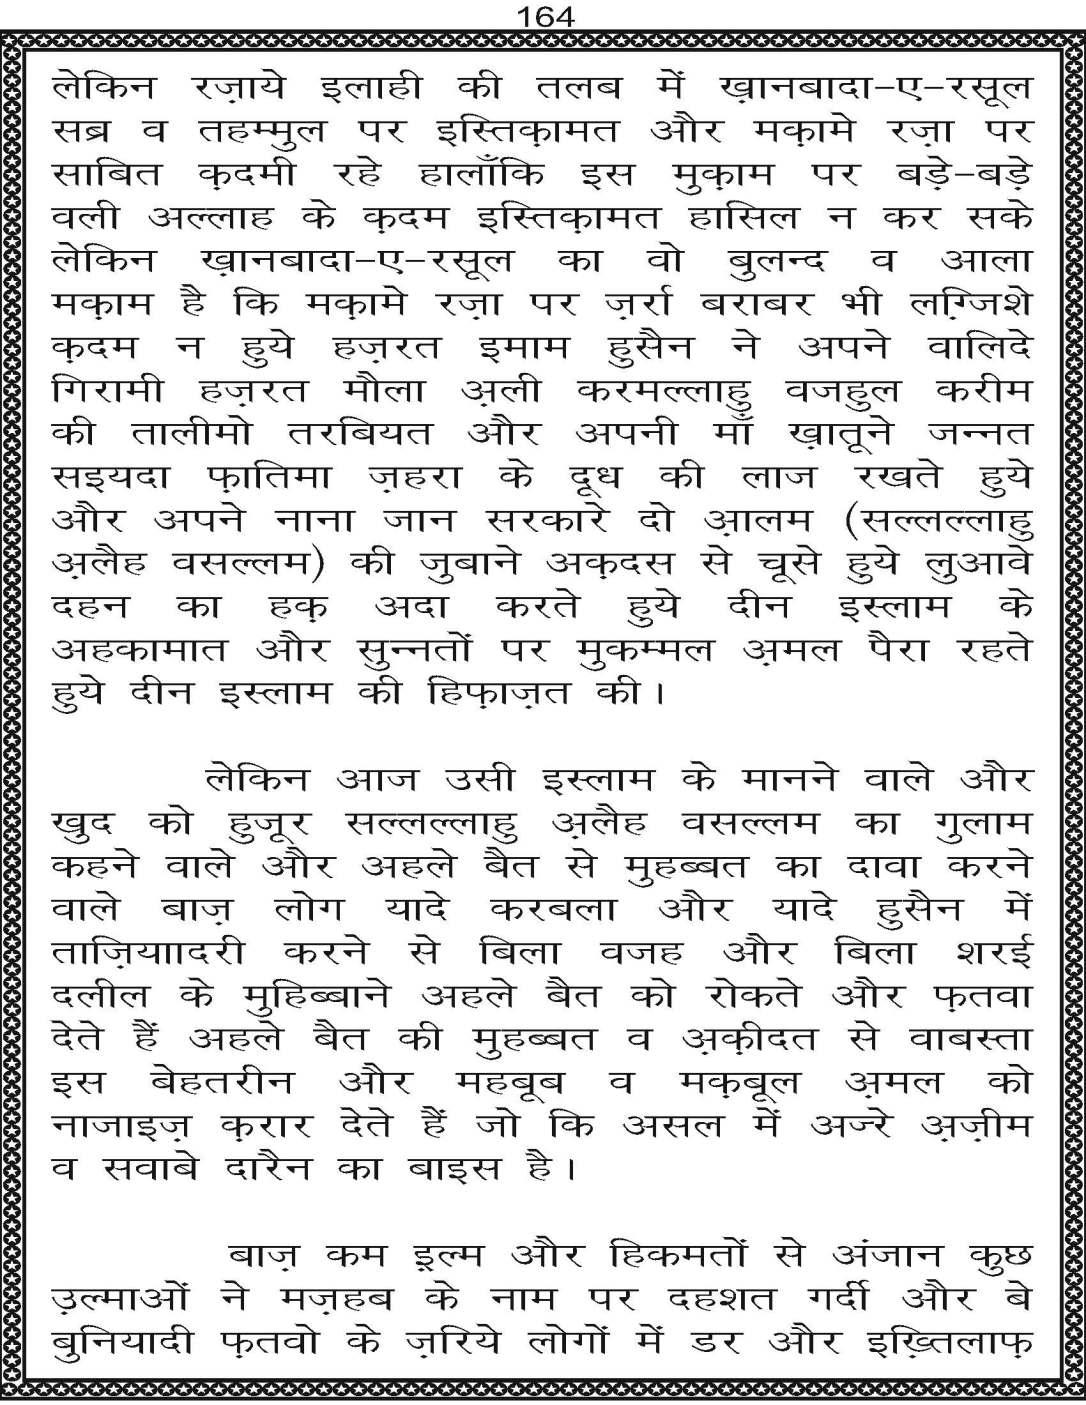 AzmateTaziyadari_Page_164